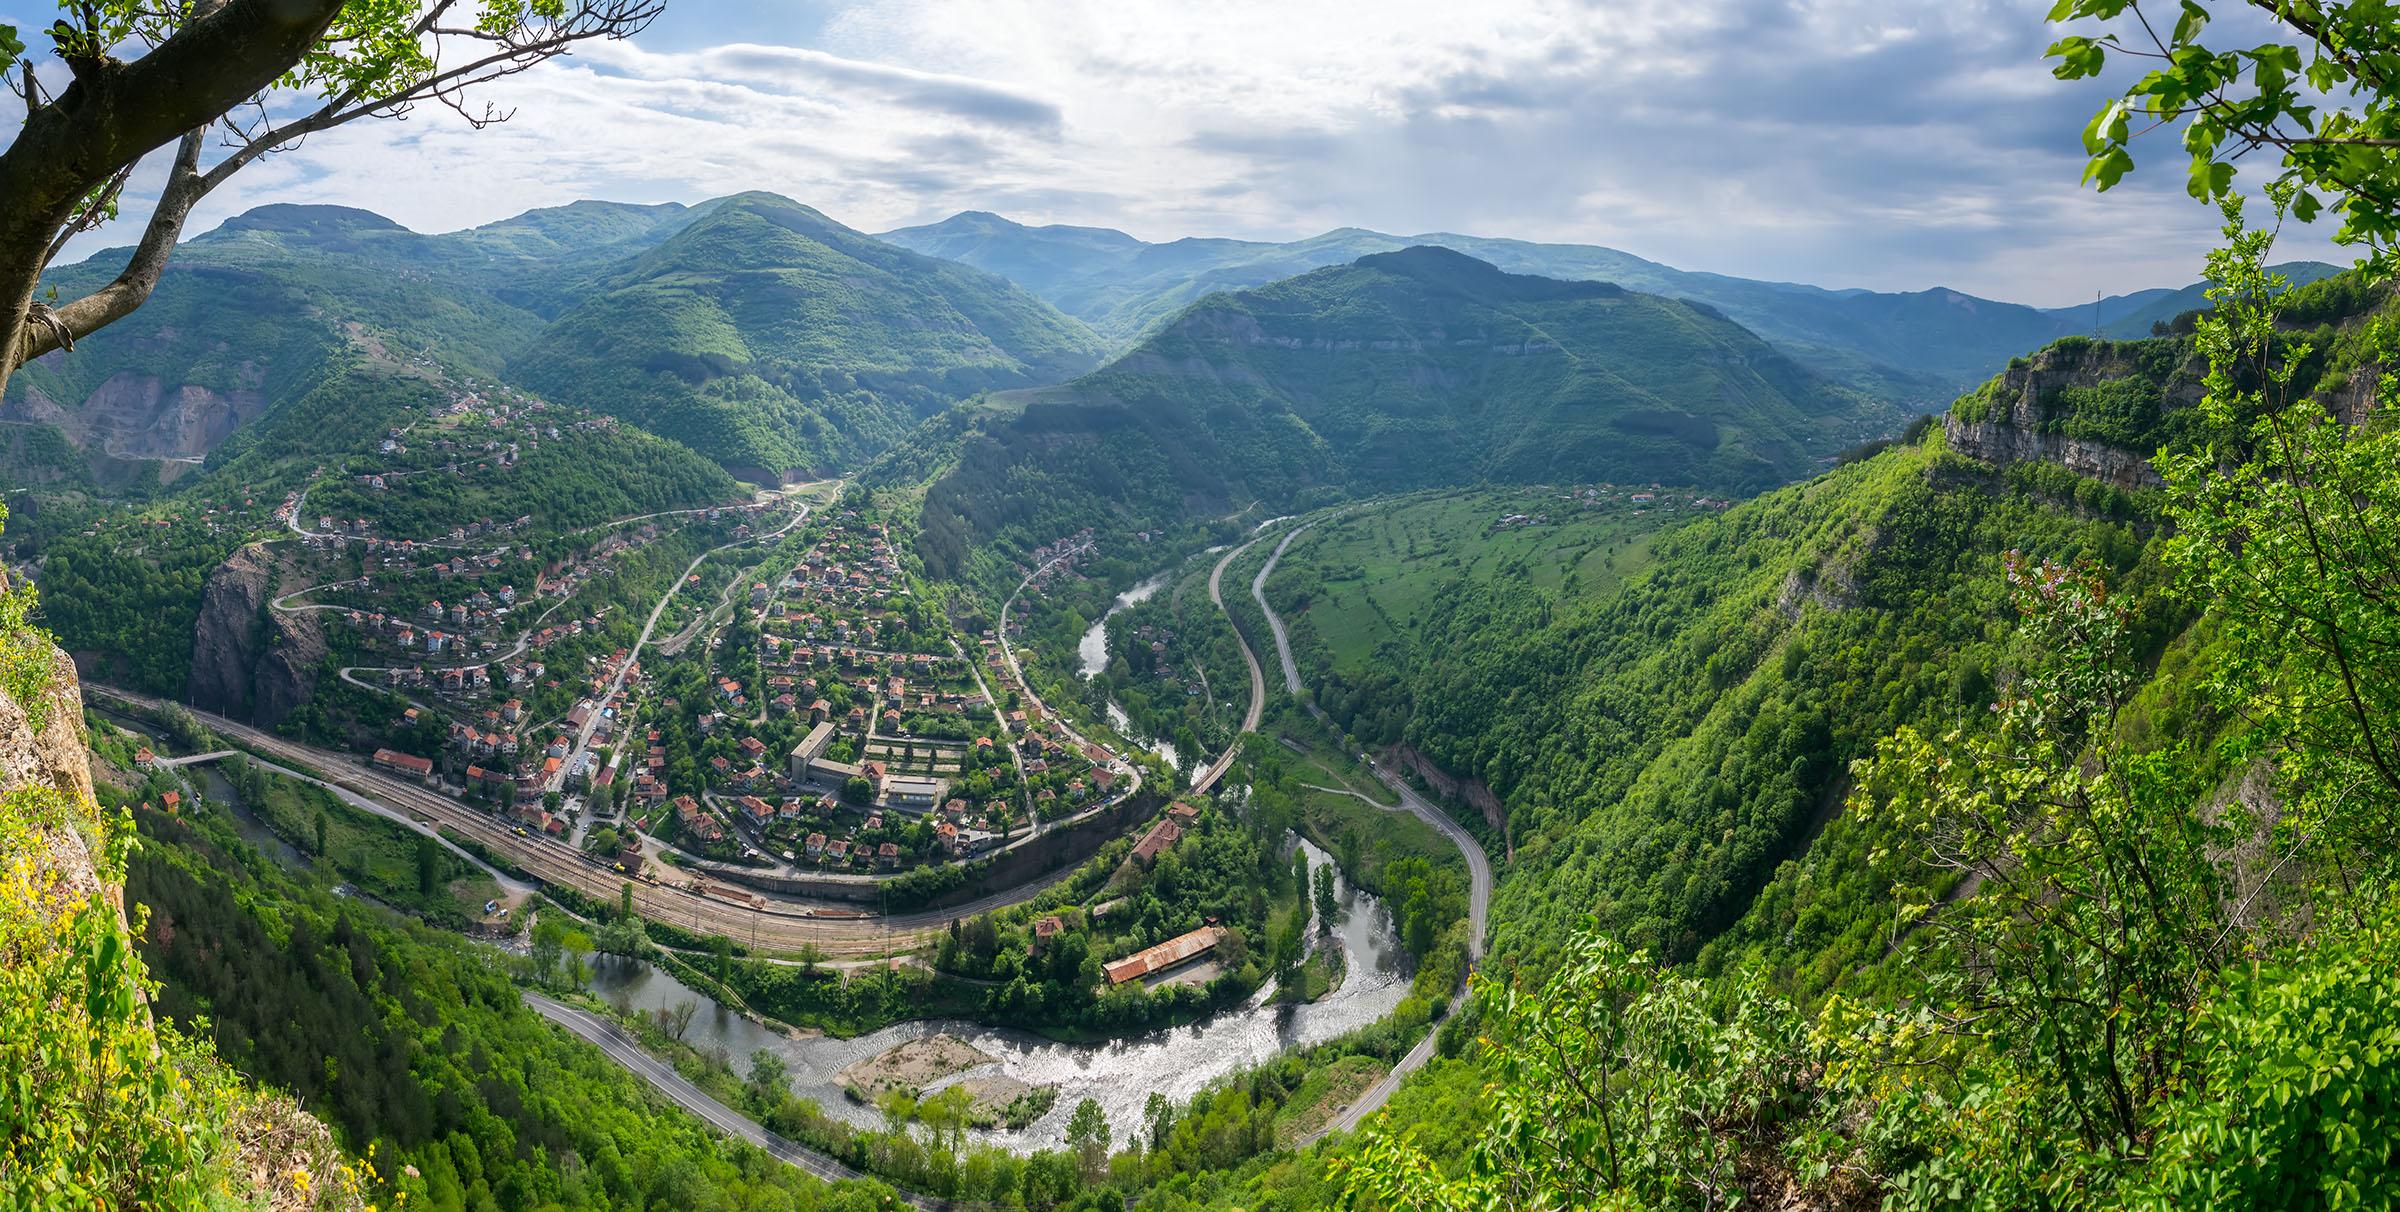 A view of Gara Bov village and Iskar River